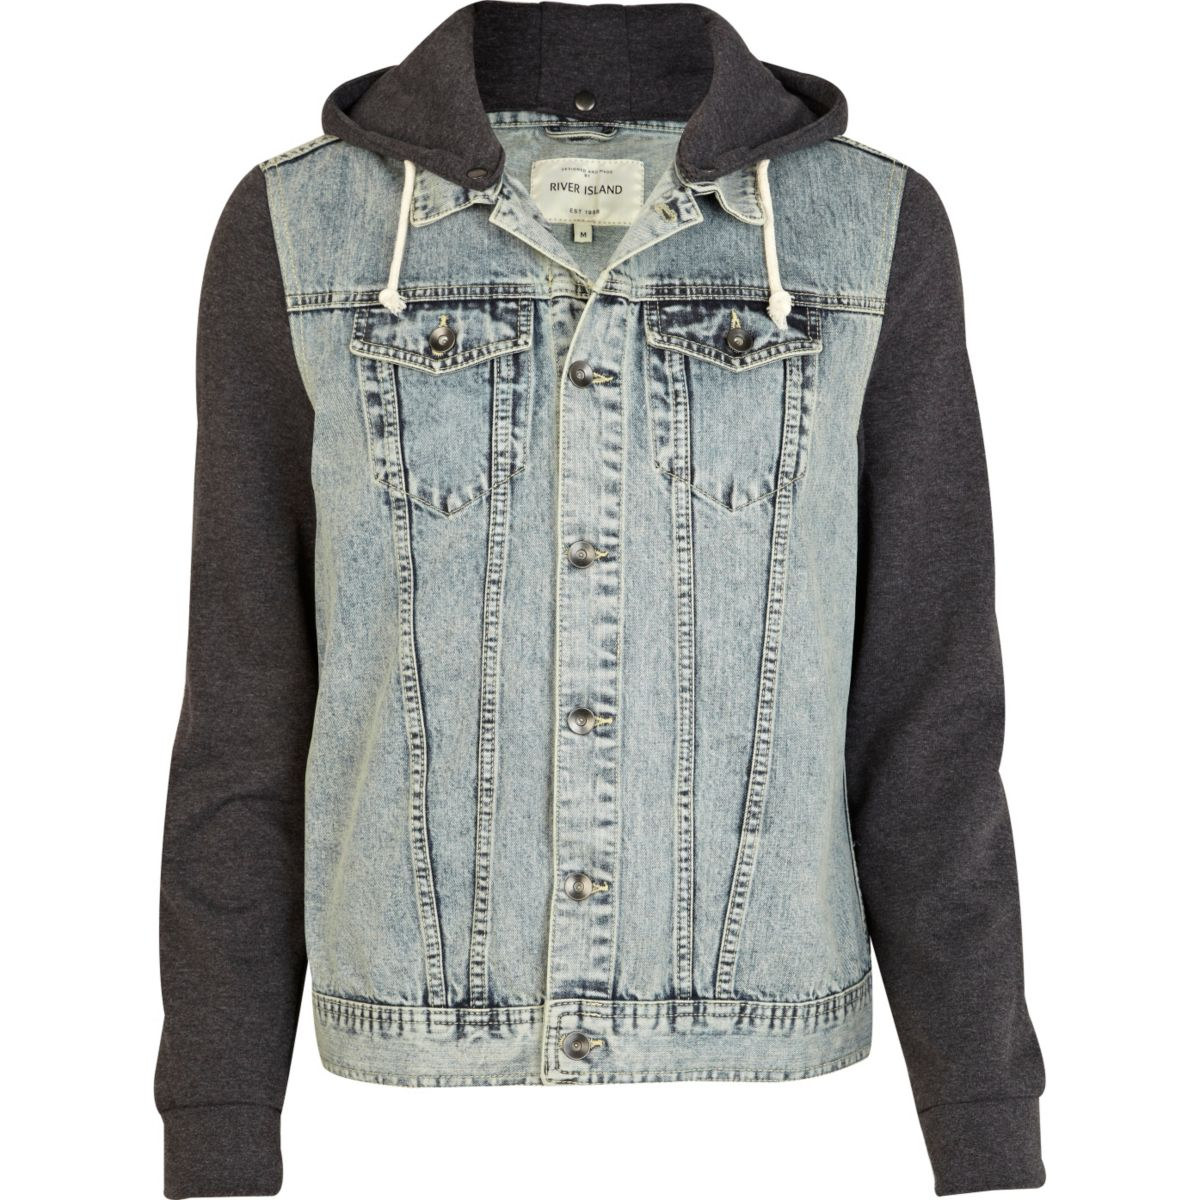 Grey jersey and denim jacket